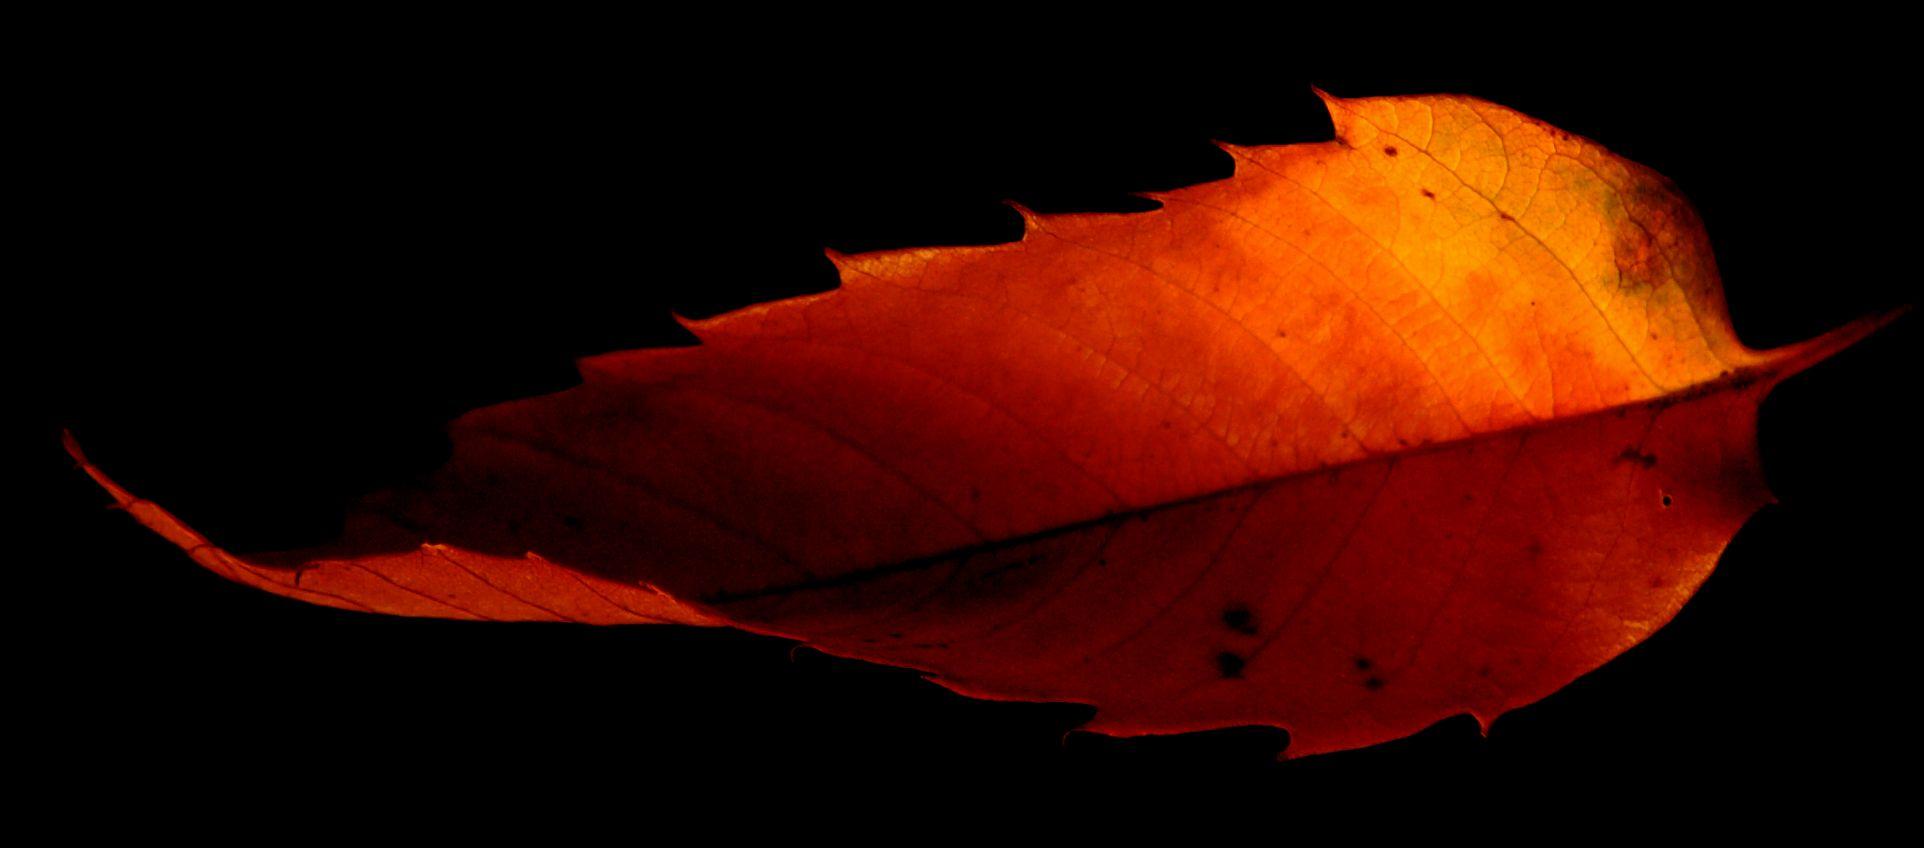 Twisted Leaf